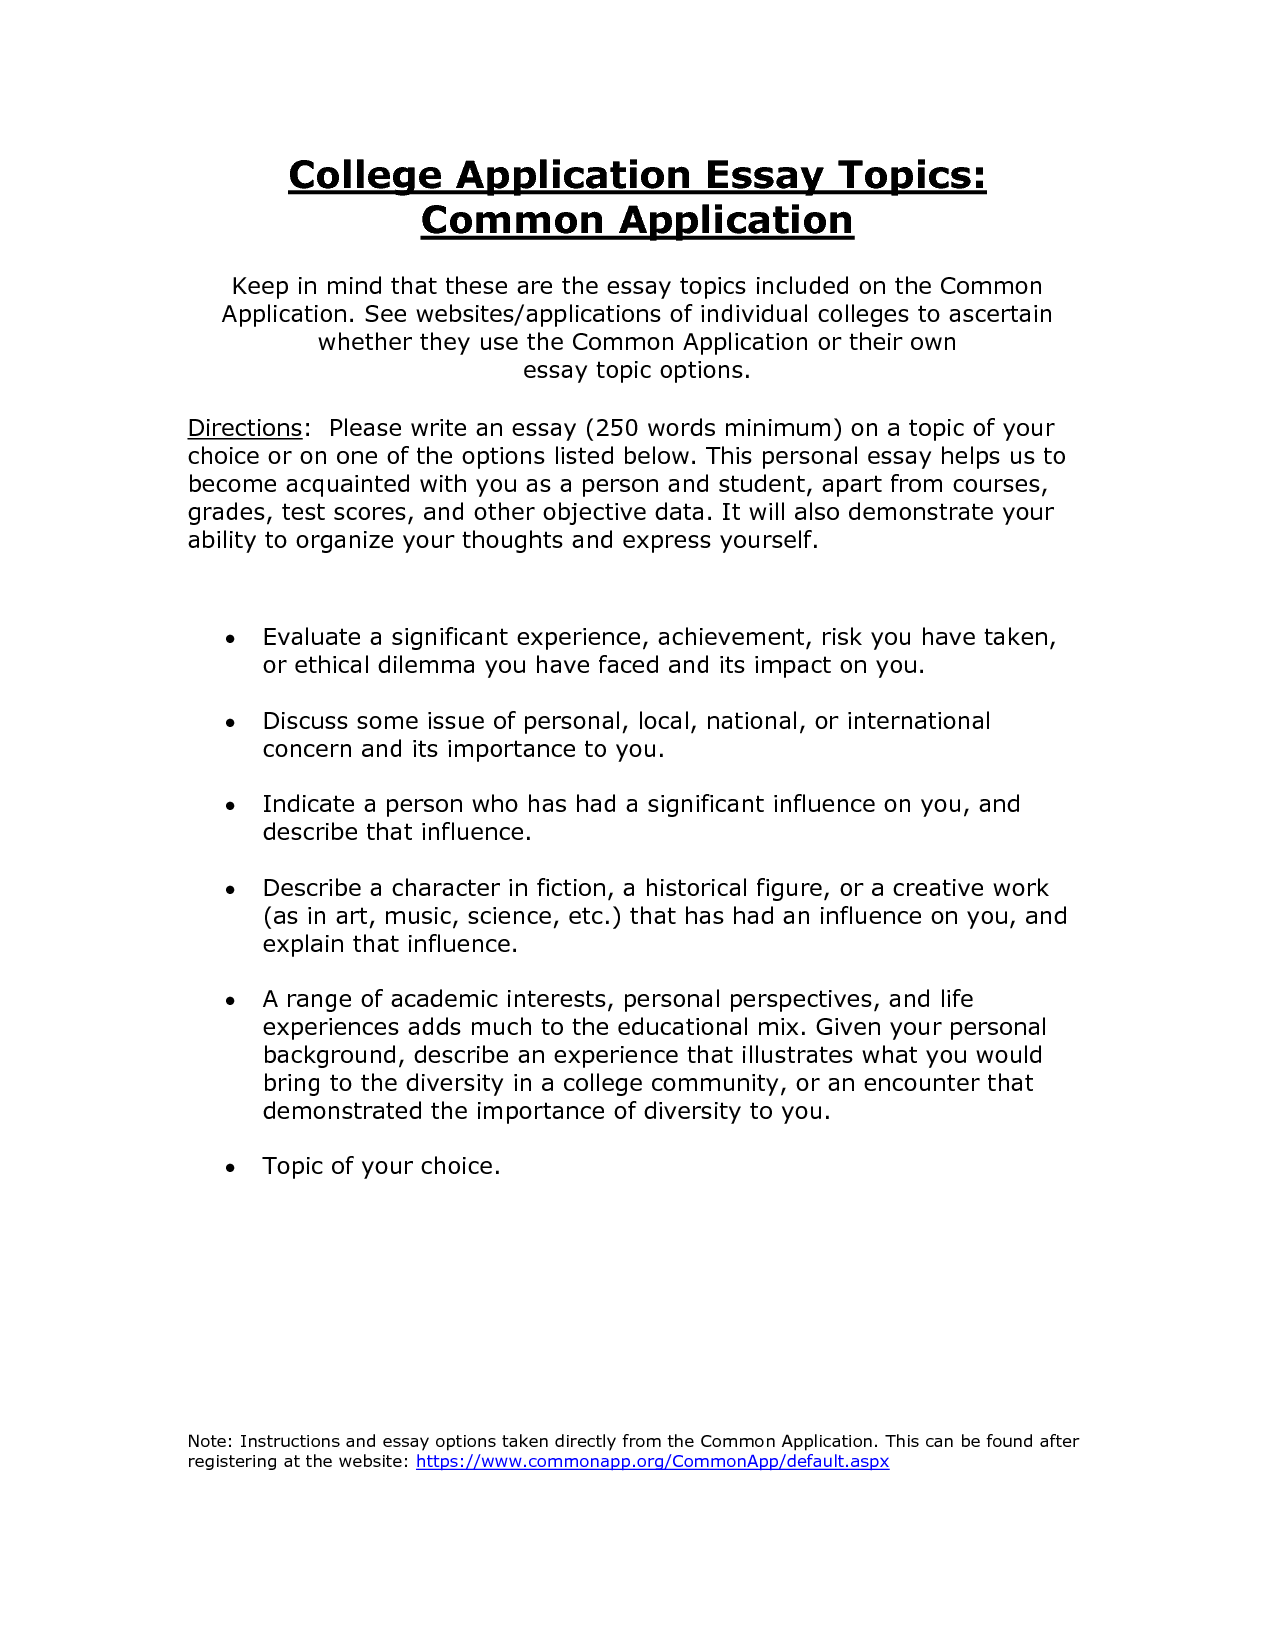 006 Vzmthii0b2 Common App Examples Best Example Essays Essay Samples Option 1 Prompt 2016 2017 Full